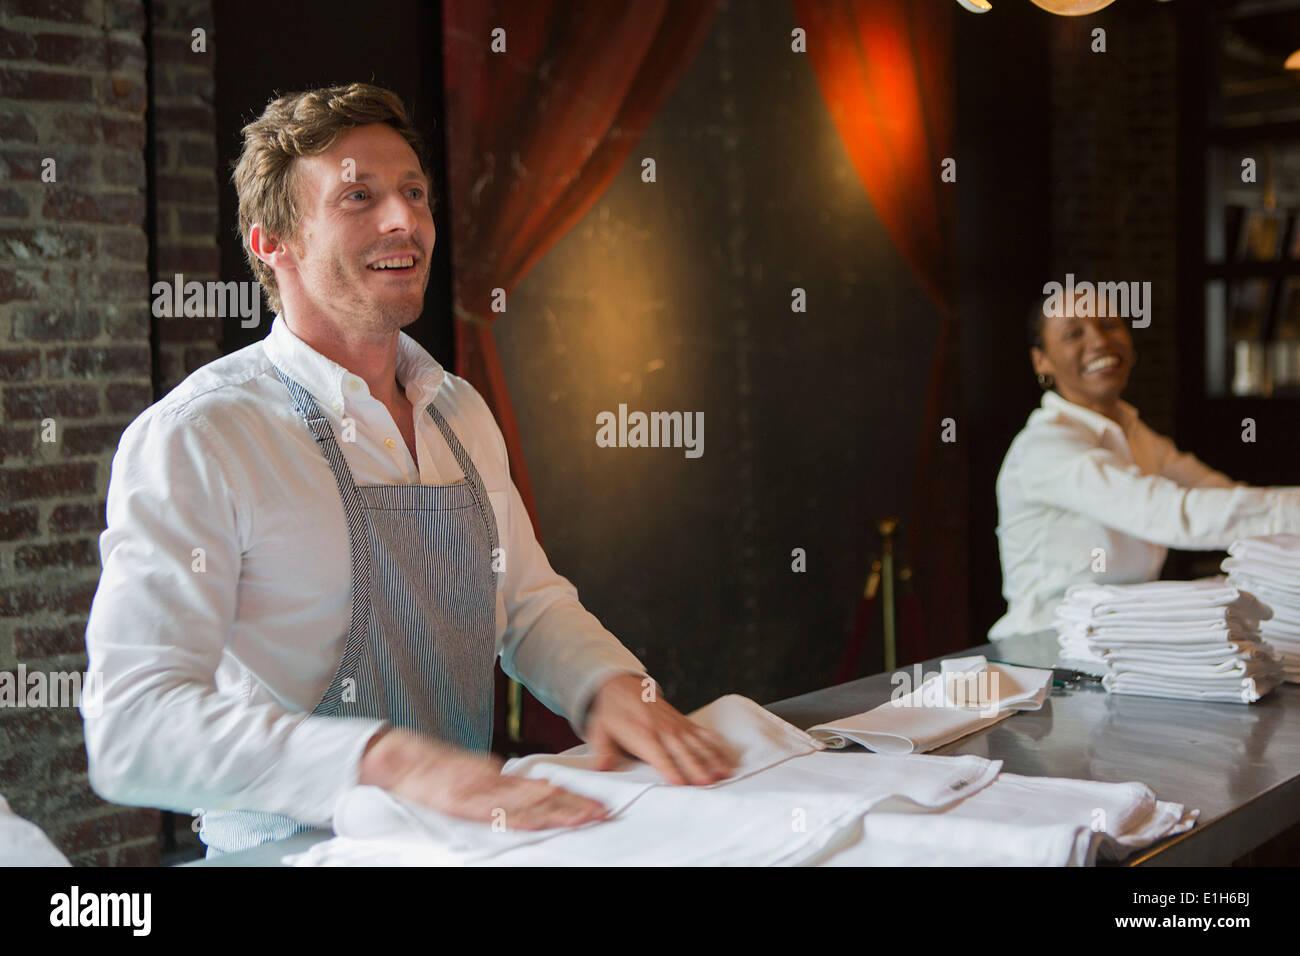 Koch und Kellnerin Falten Servietten im restaurant Stockbild